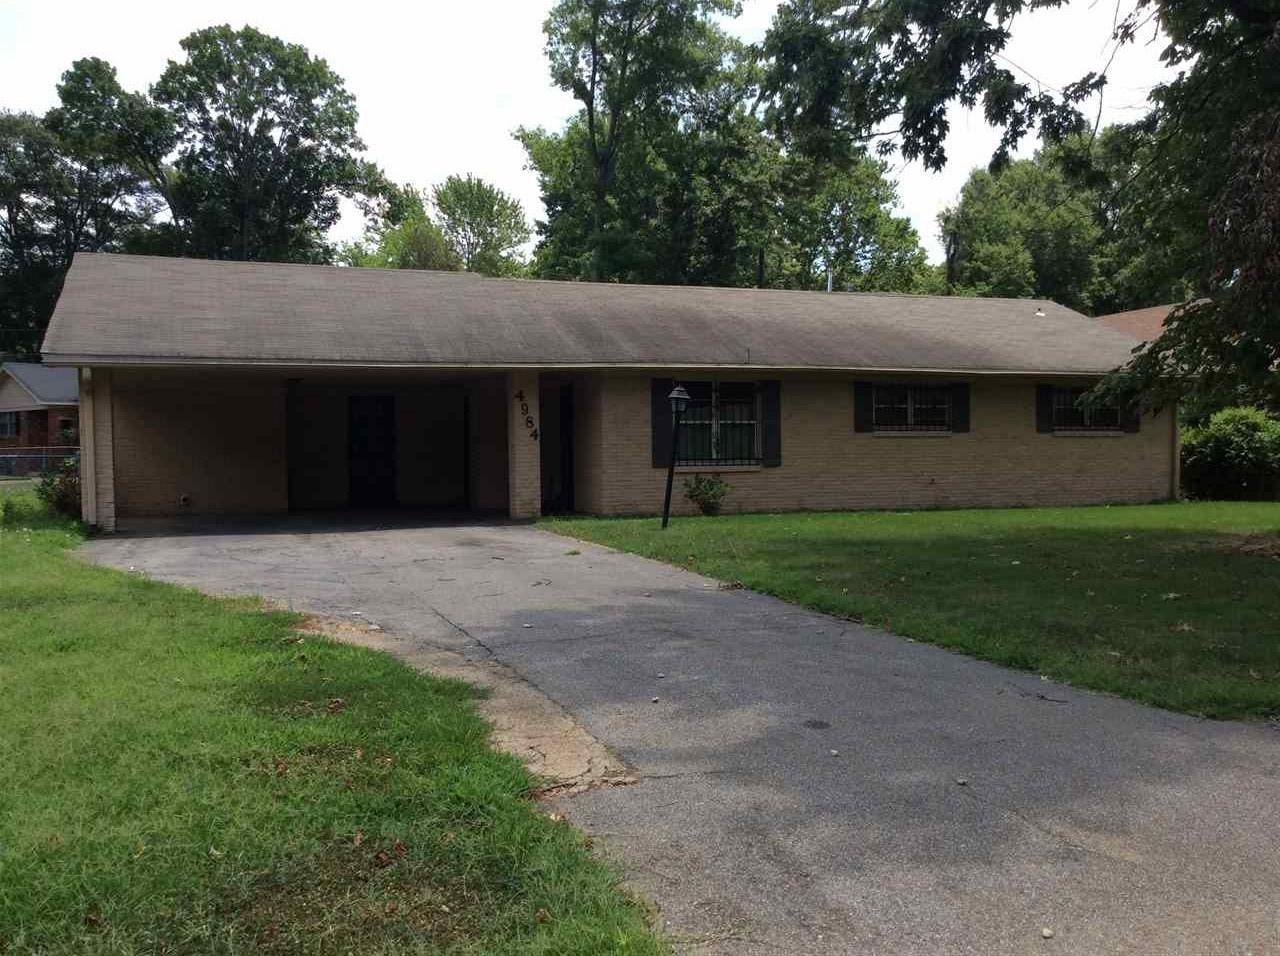 4984 Childs Memphis, TN 38116 - MLS #: 10018552